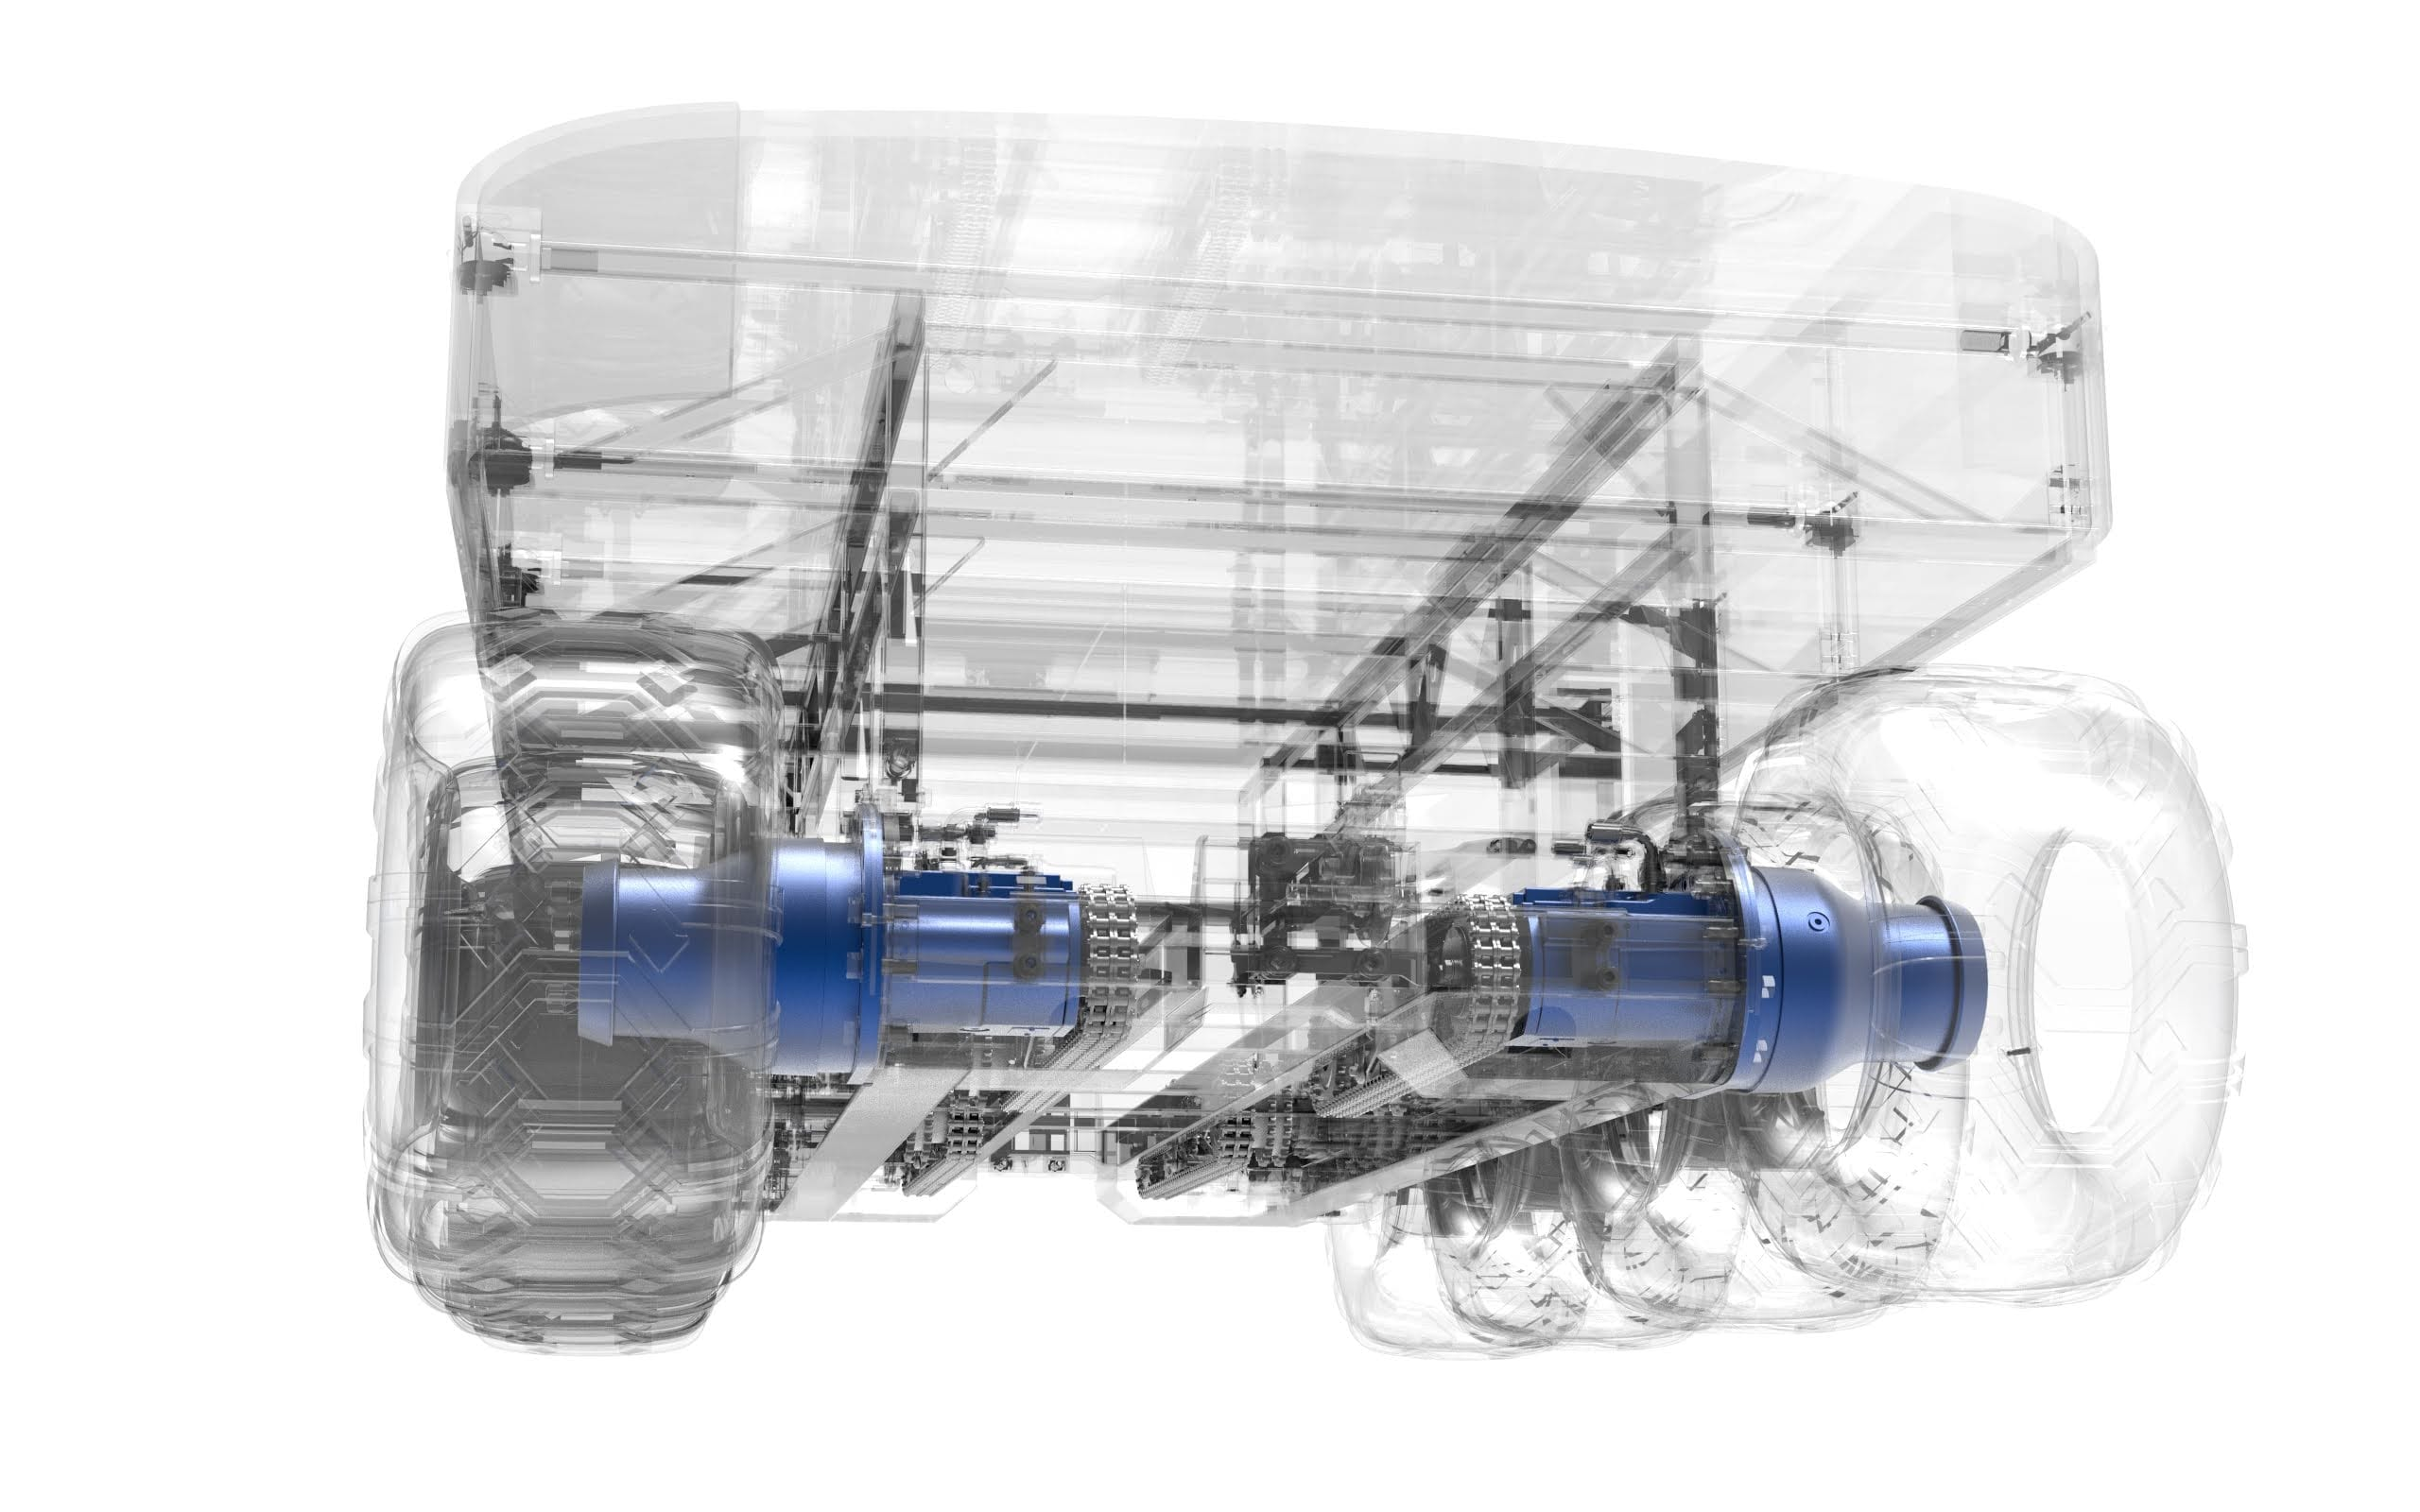 Hydarulic motor for all-terrain vehicle